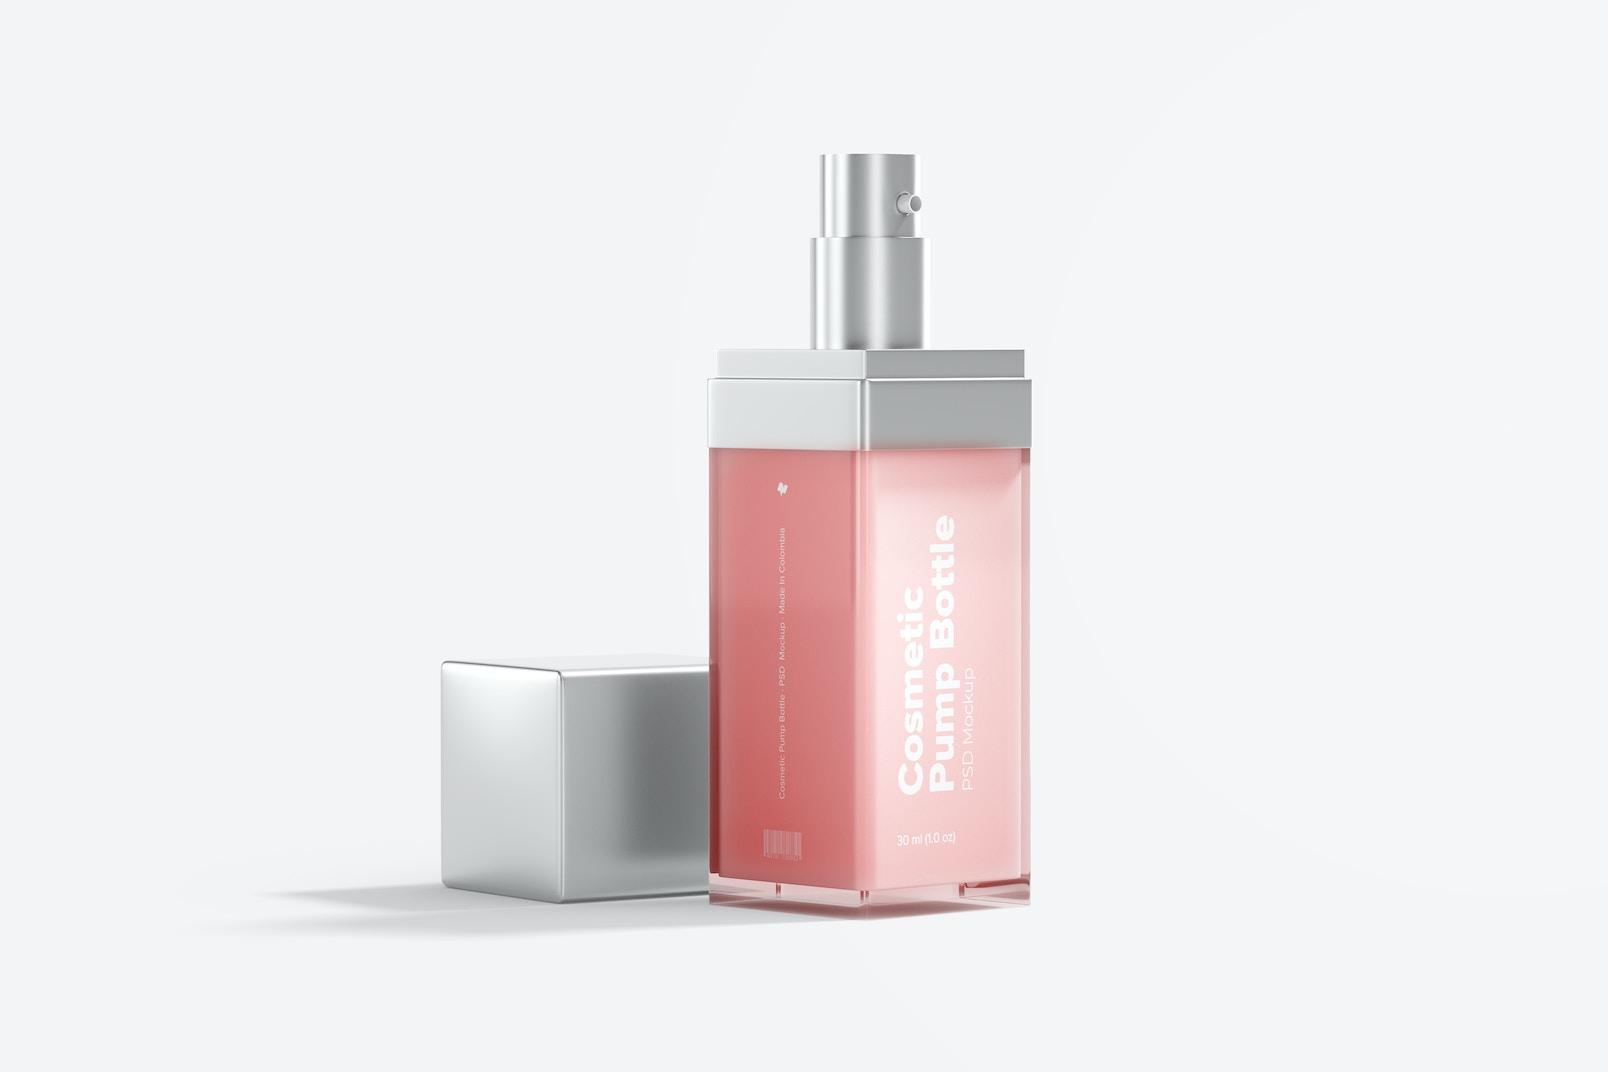 Cosmetic Pump Bottle Mockup, Opened